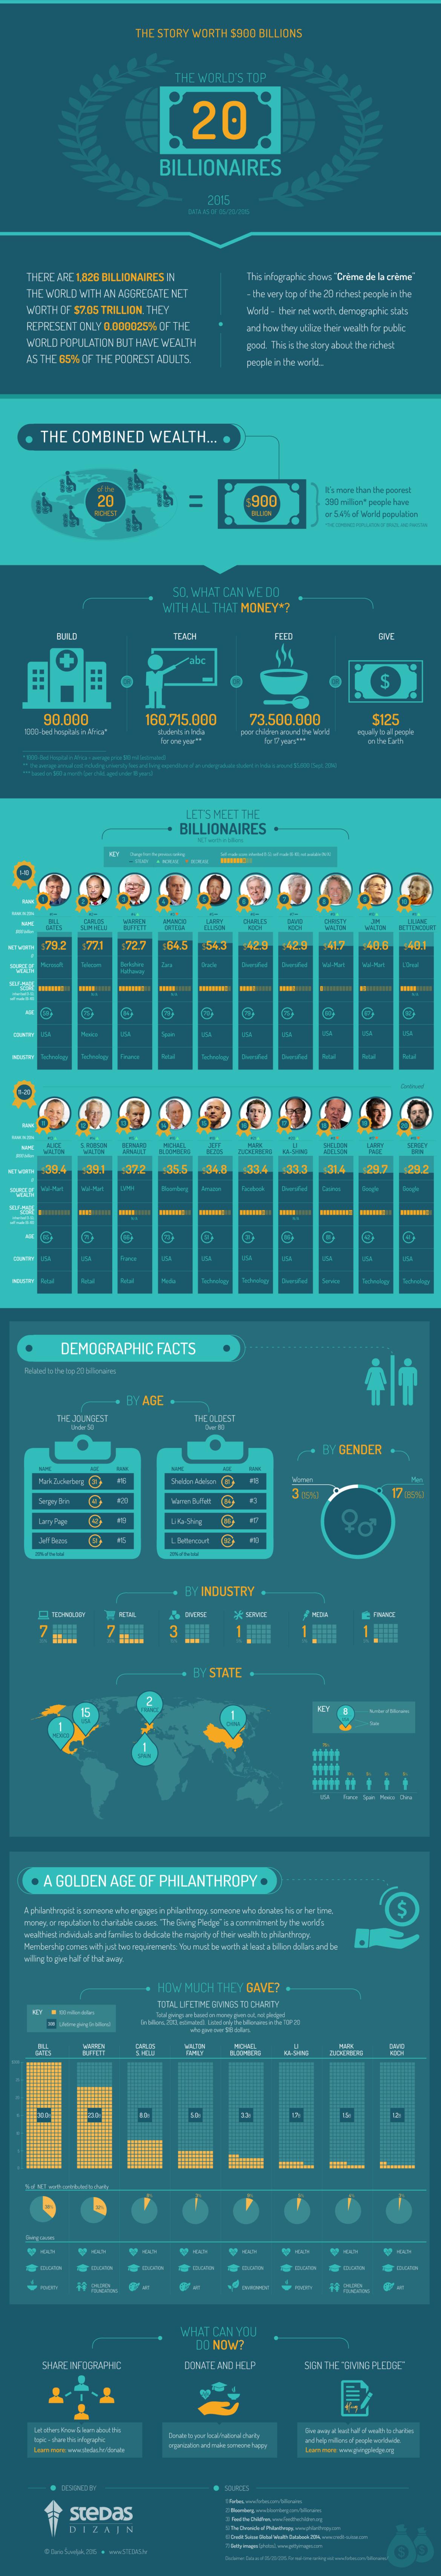 The World's Top 20 Billionaires (2015)